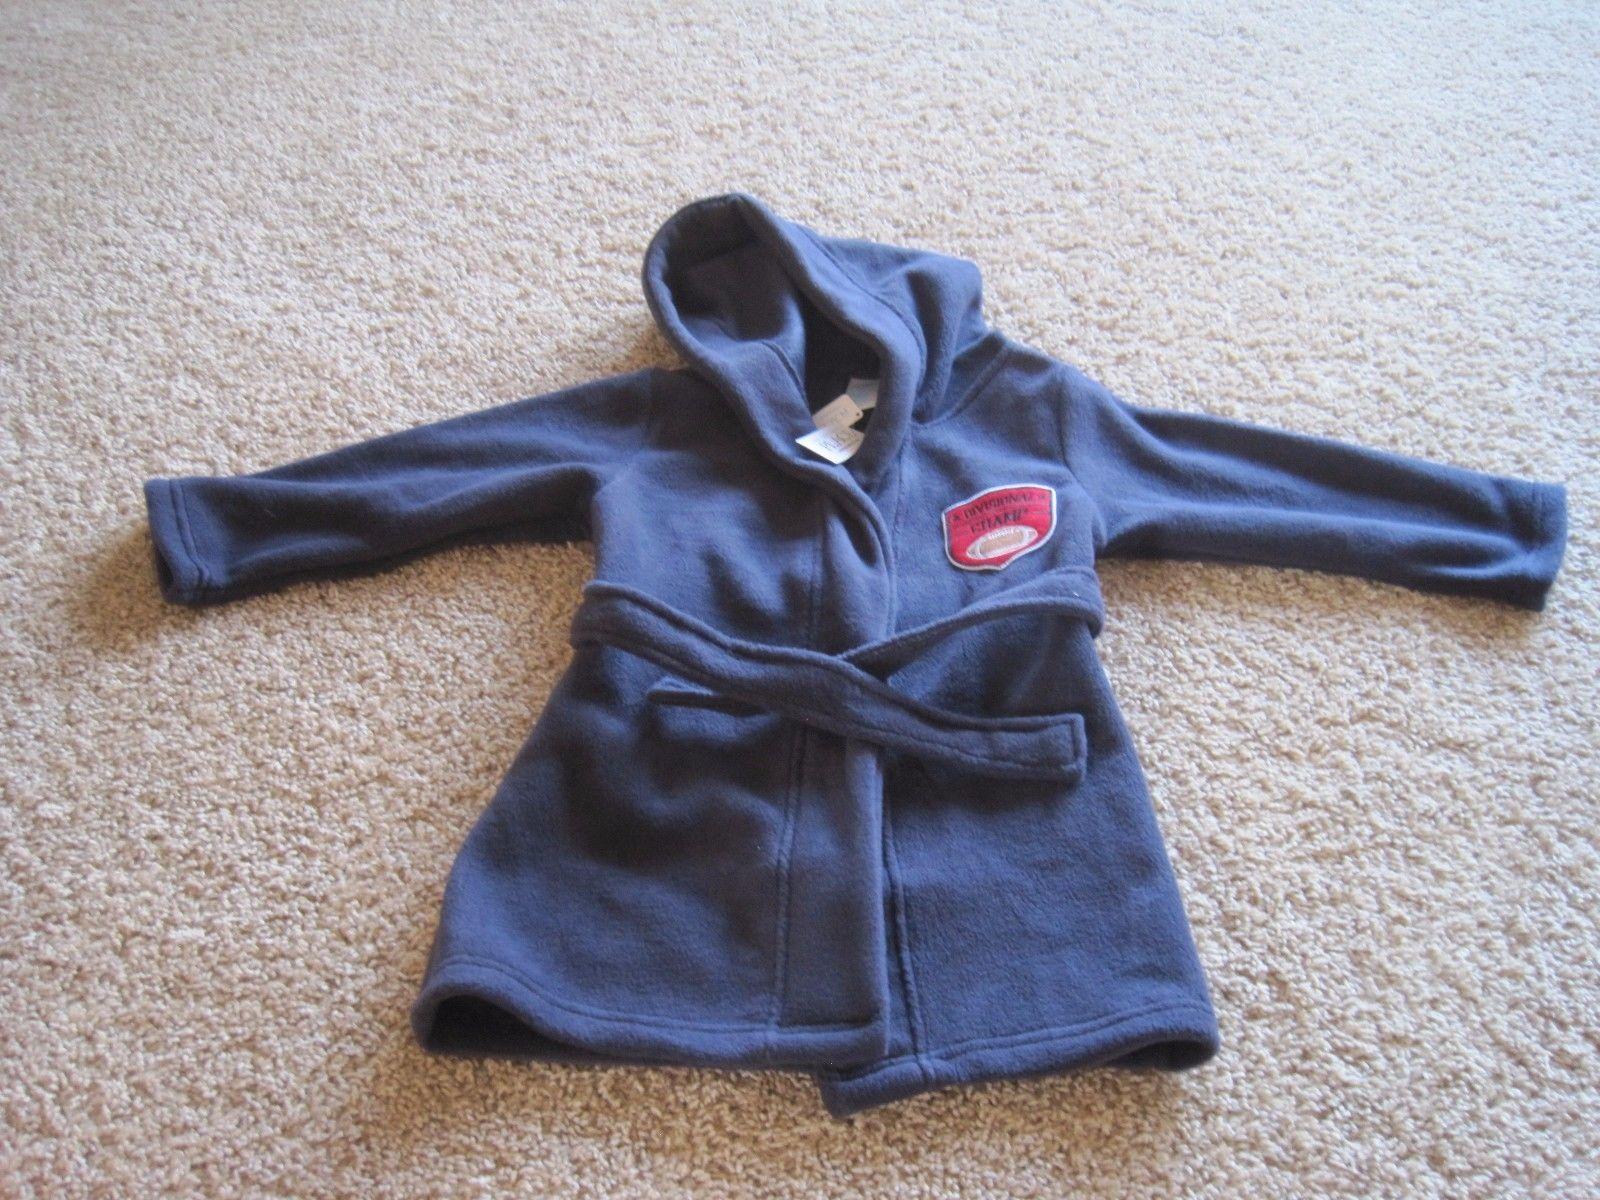 BNWT The Children's Place Long sleeve champ fleece robe, boys, hood, $29.95 - $19.00